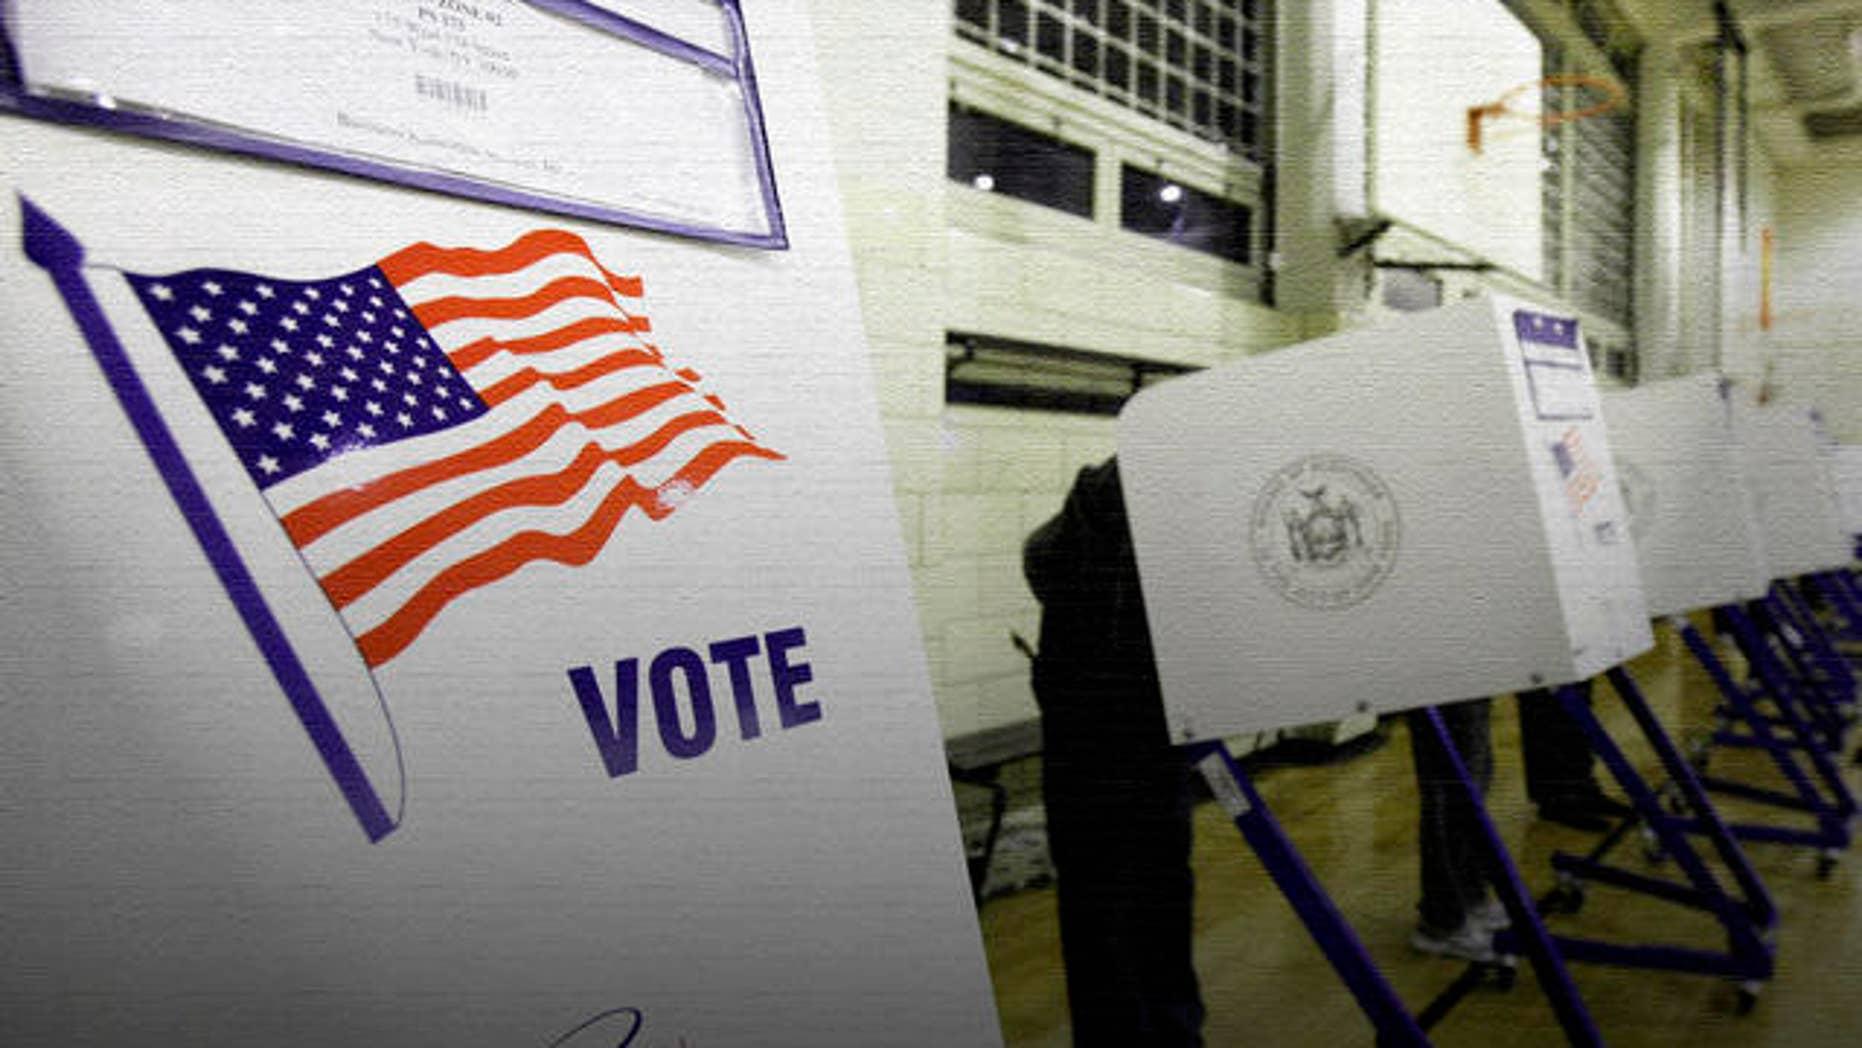 Voters cast their ballots in a school gym in New York's Harlem neighborhood,  Tuesday, Nov. 2, 2010. (AP Photo/Richard Drew)